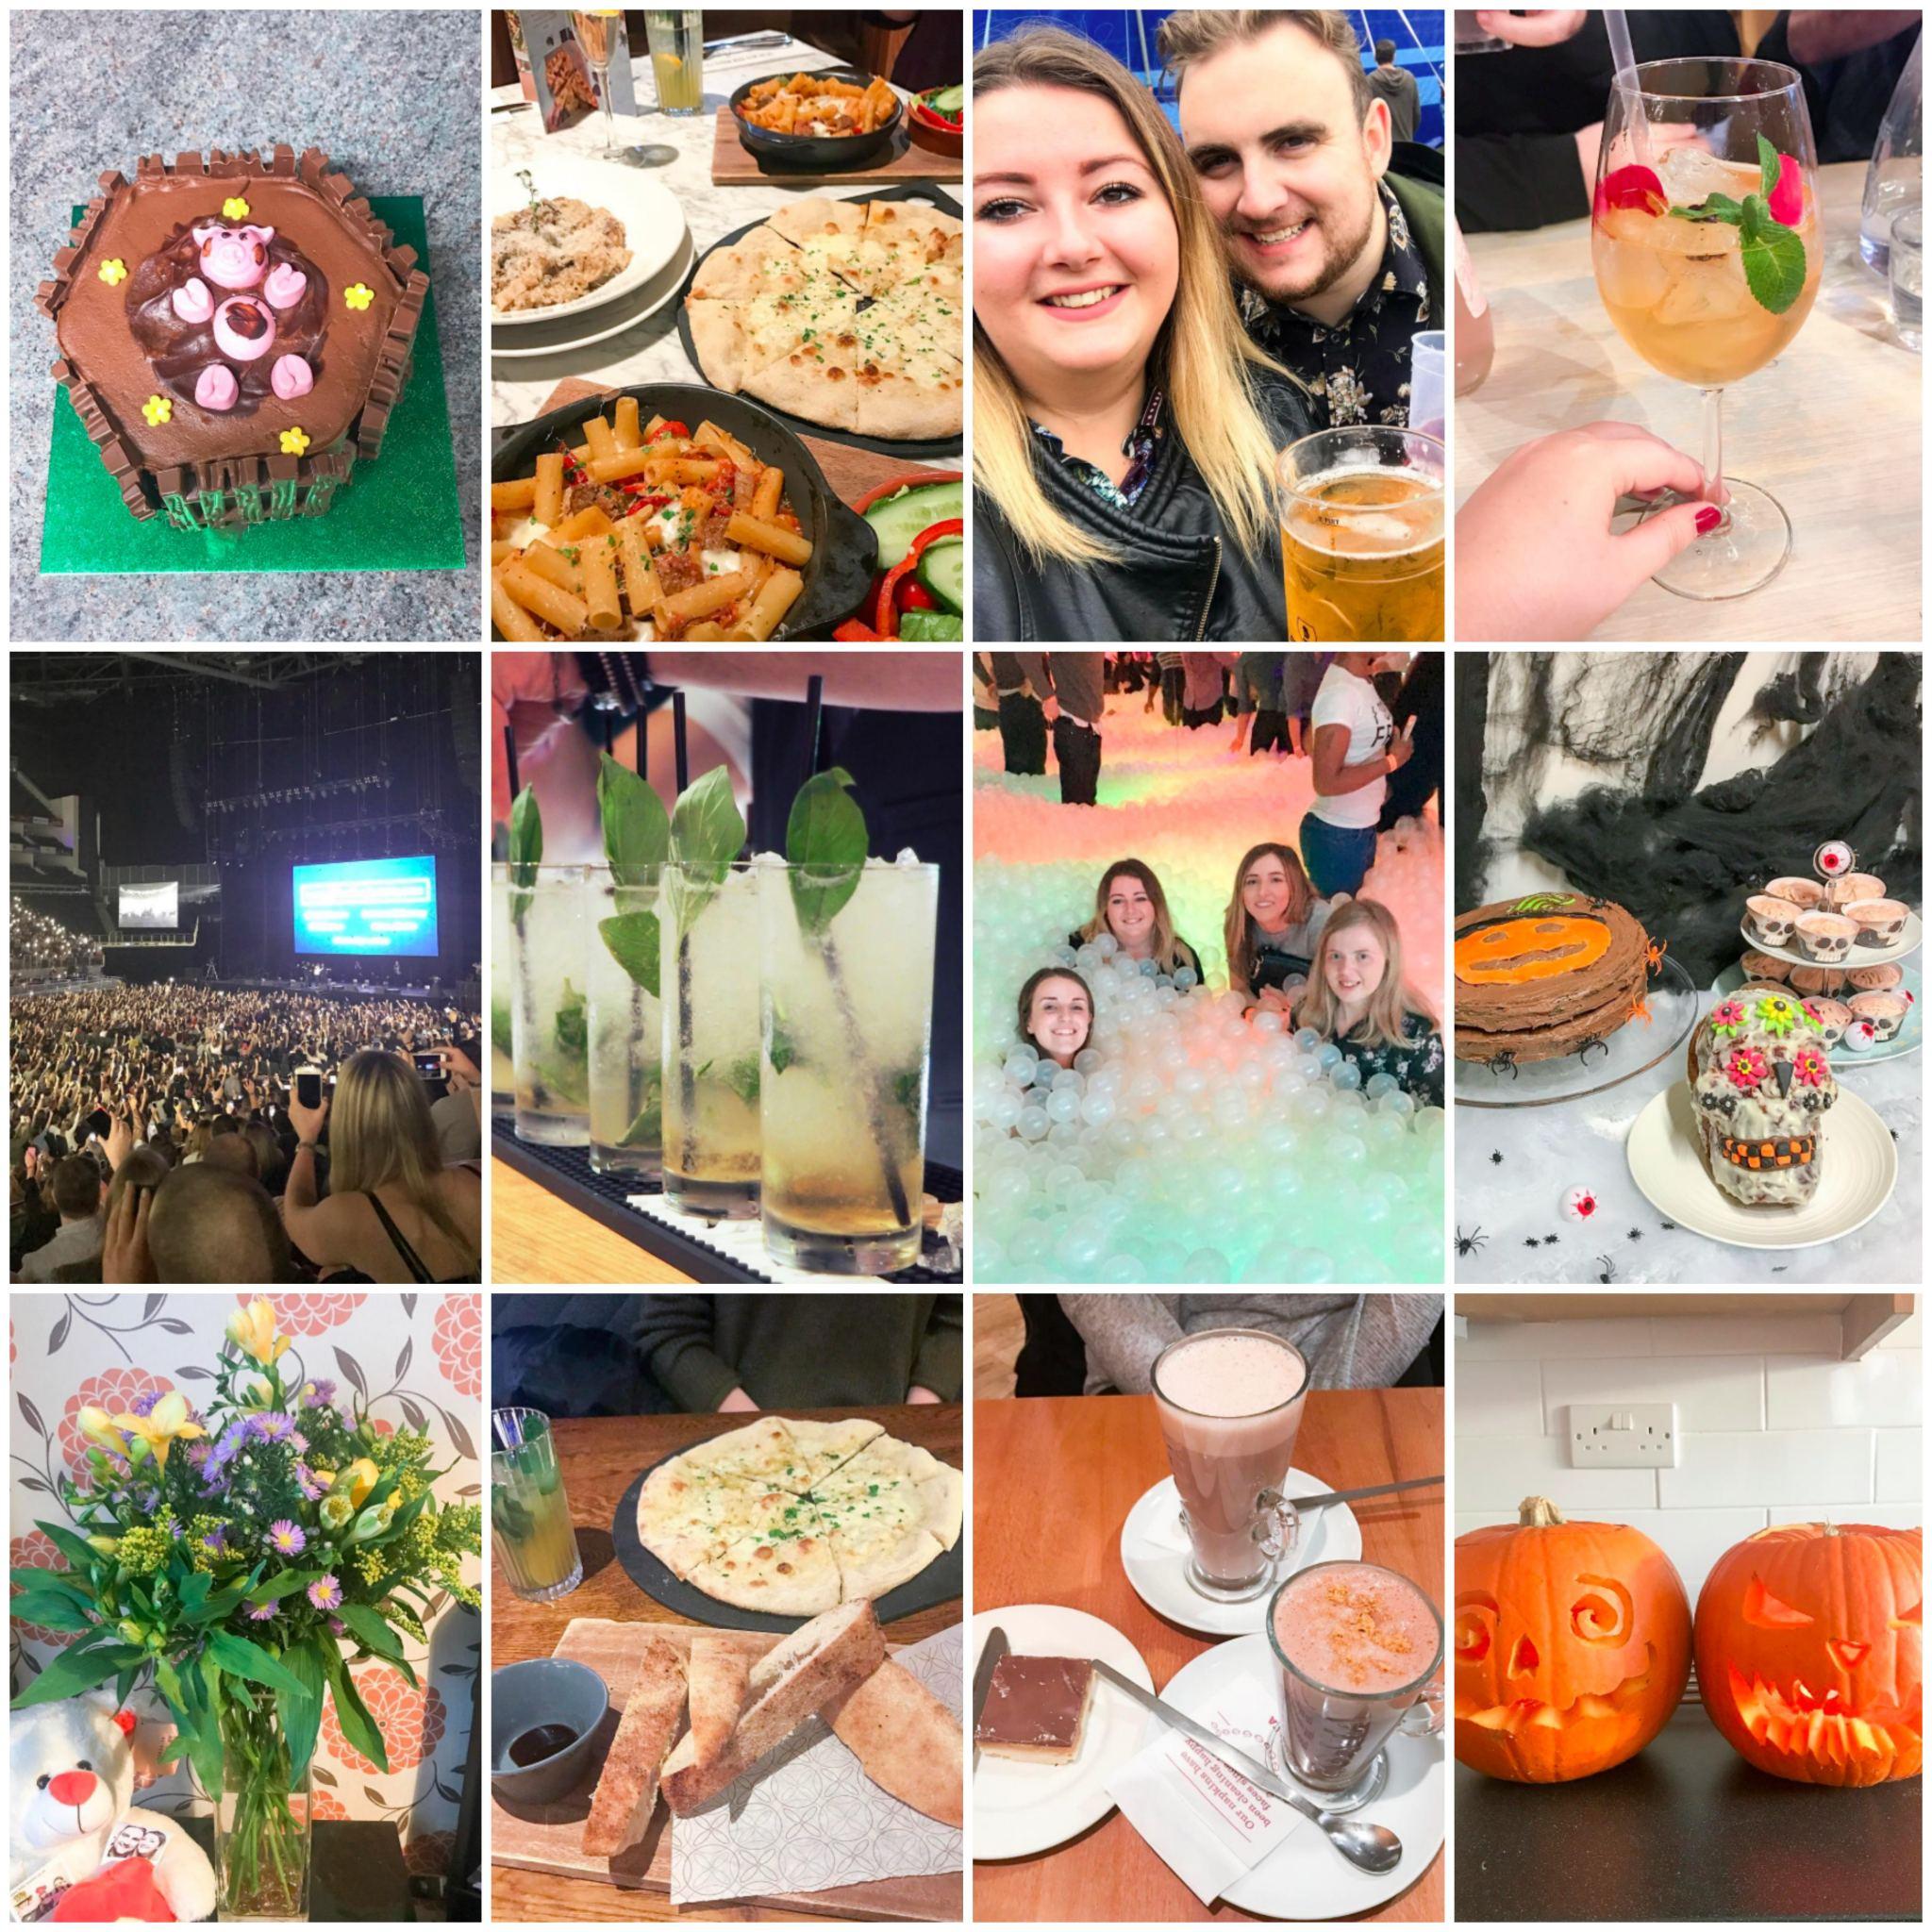 hannatalks october 2017 month in photos